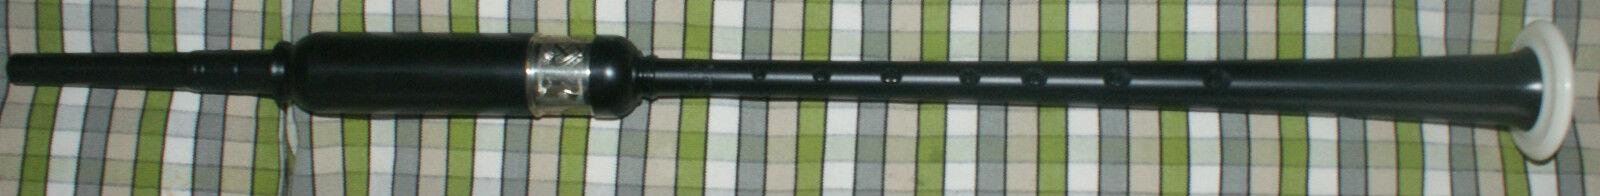 McCallum Pipe Chanter Größe Plastic Practice Chanter Zoomorphic Engraved Ferrule